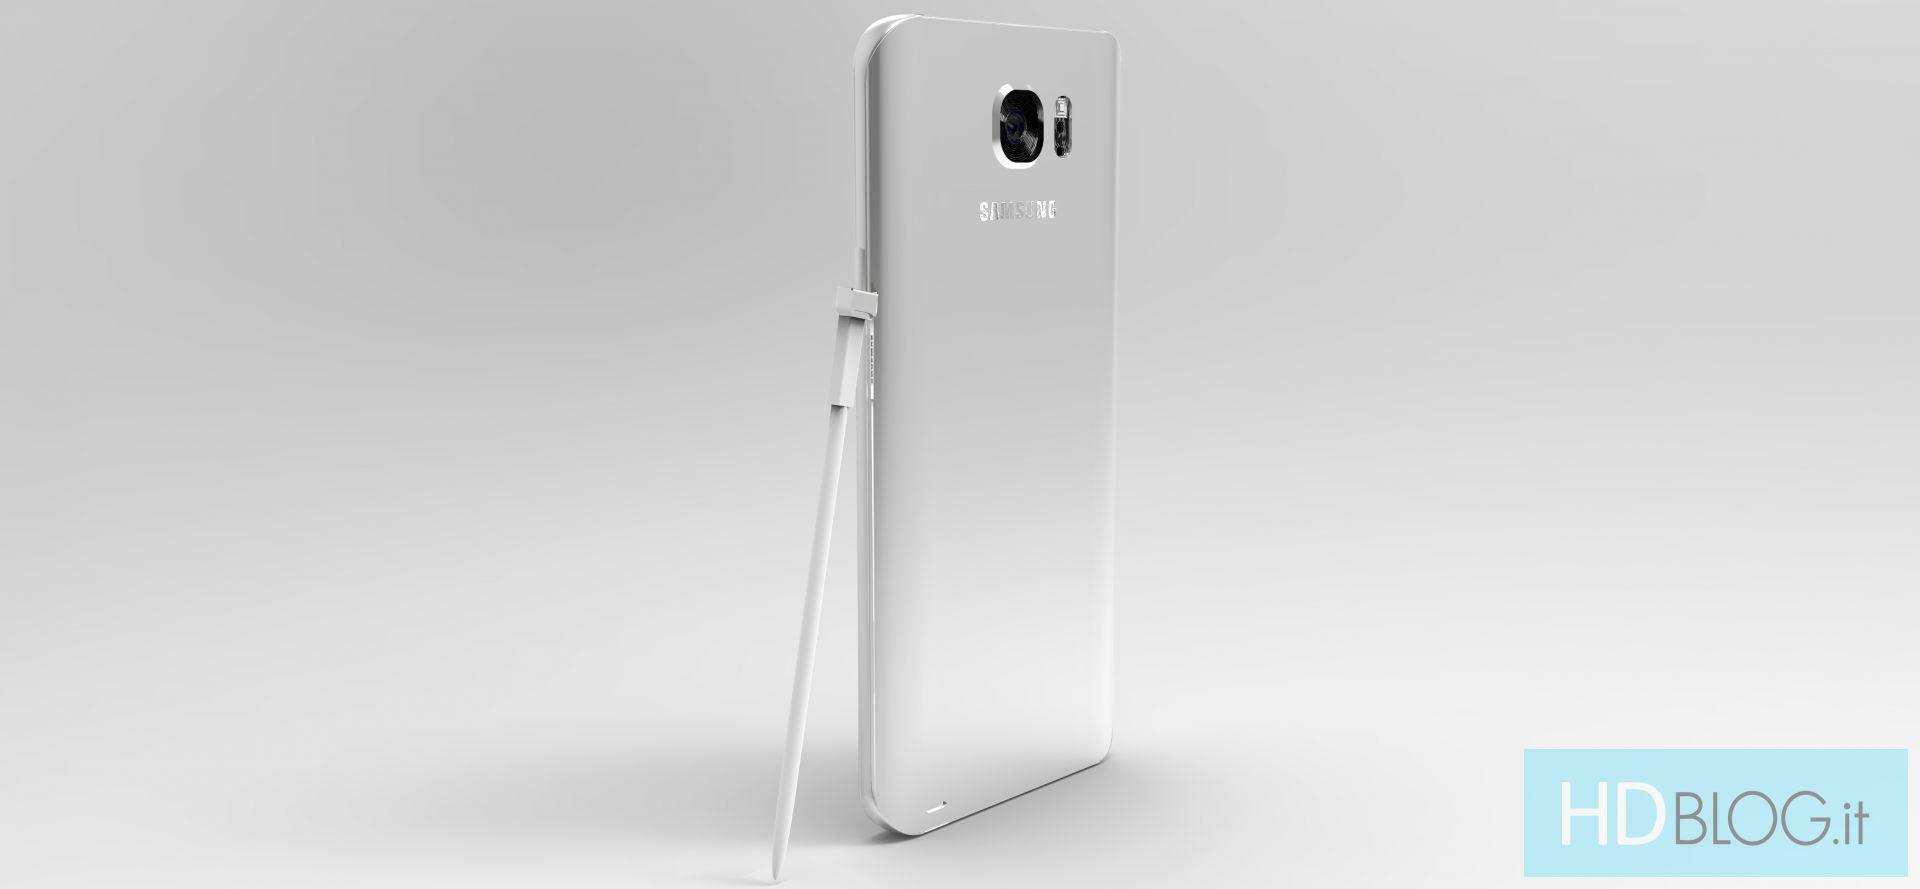 Galaxy-Note-5-schematics-and-concept-renders-10.jpg